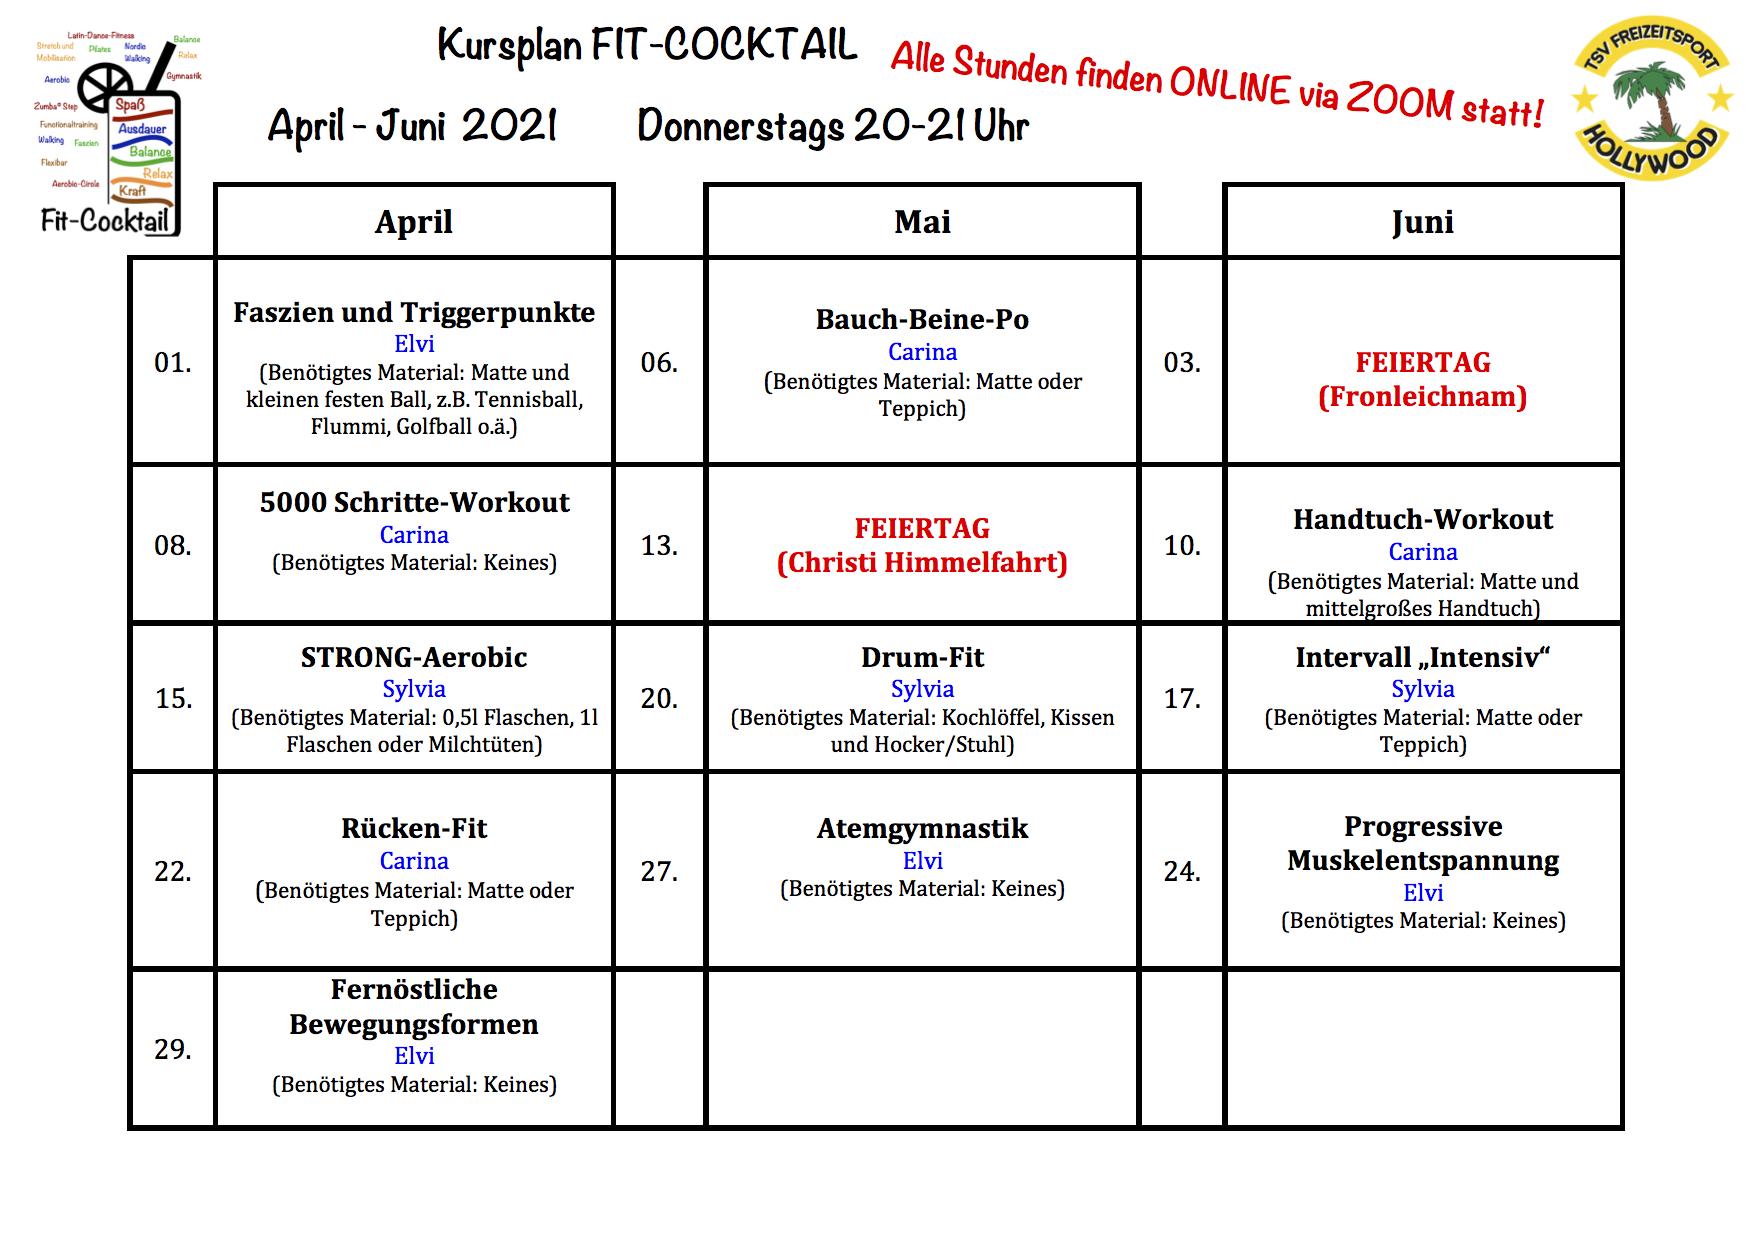 Fitcocktail Plan Online April-Juni2021